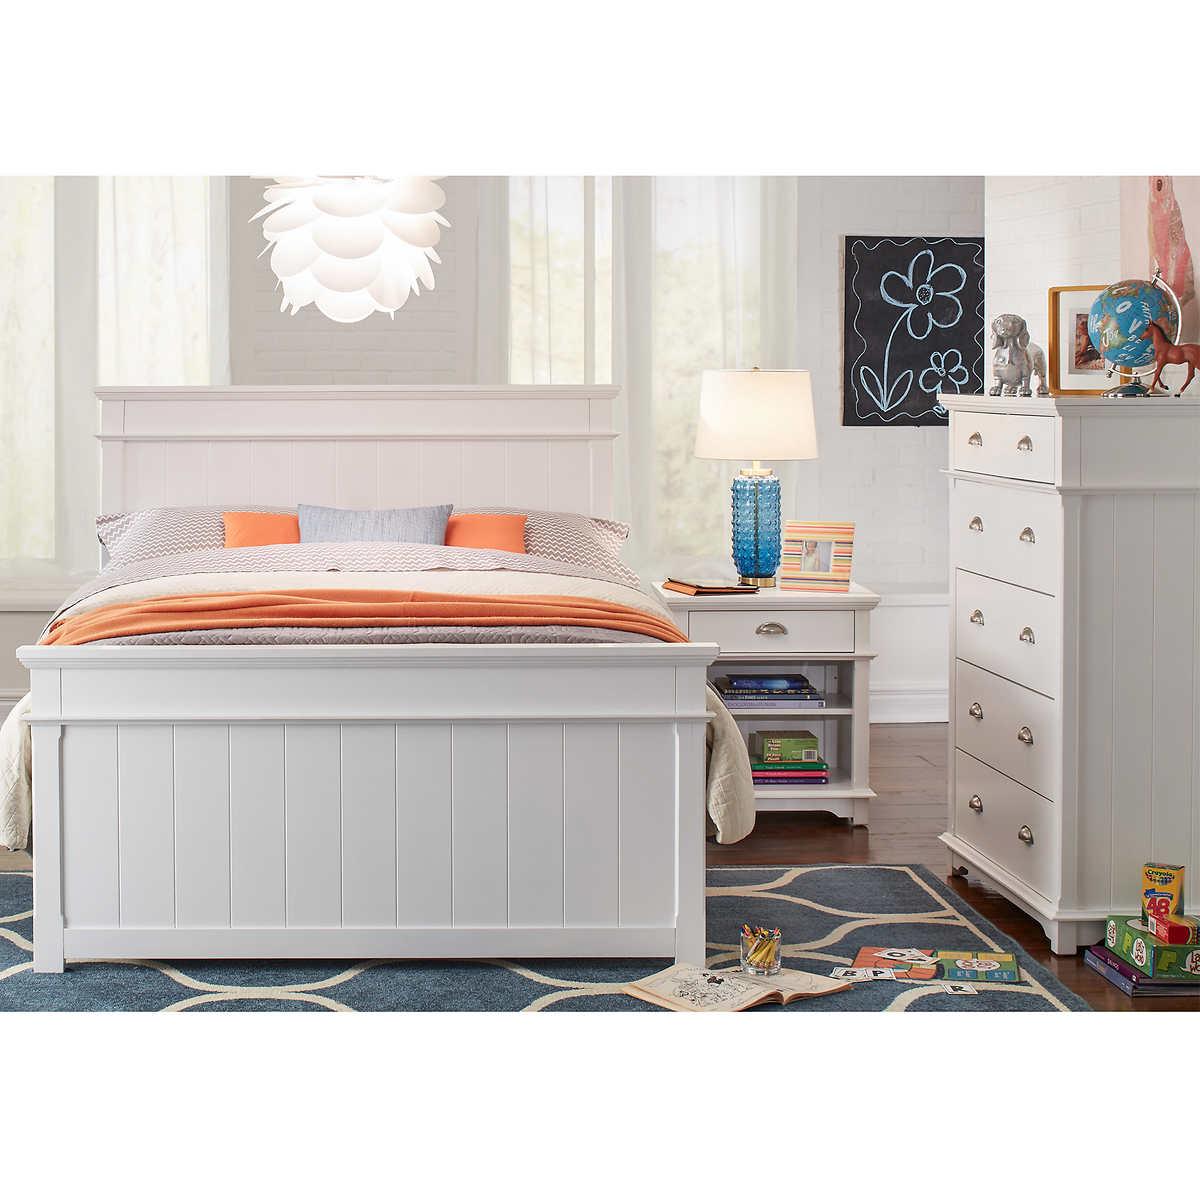 Annette 3 piece Full Bedroom Set. Twin Bedroom Sets